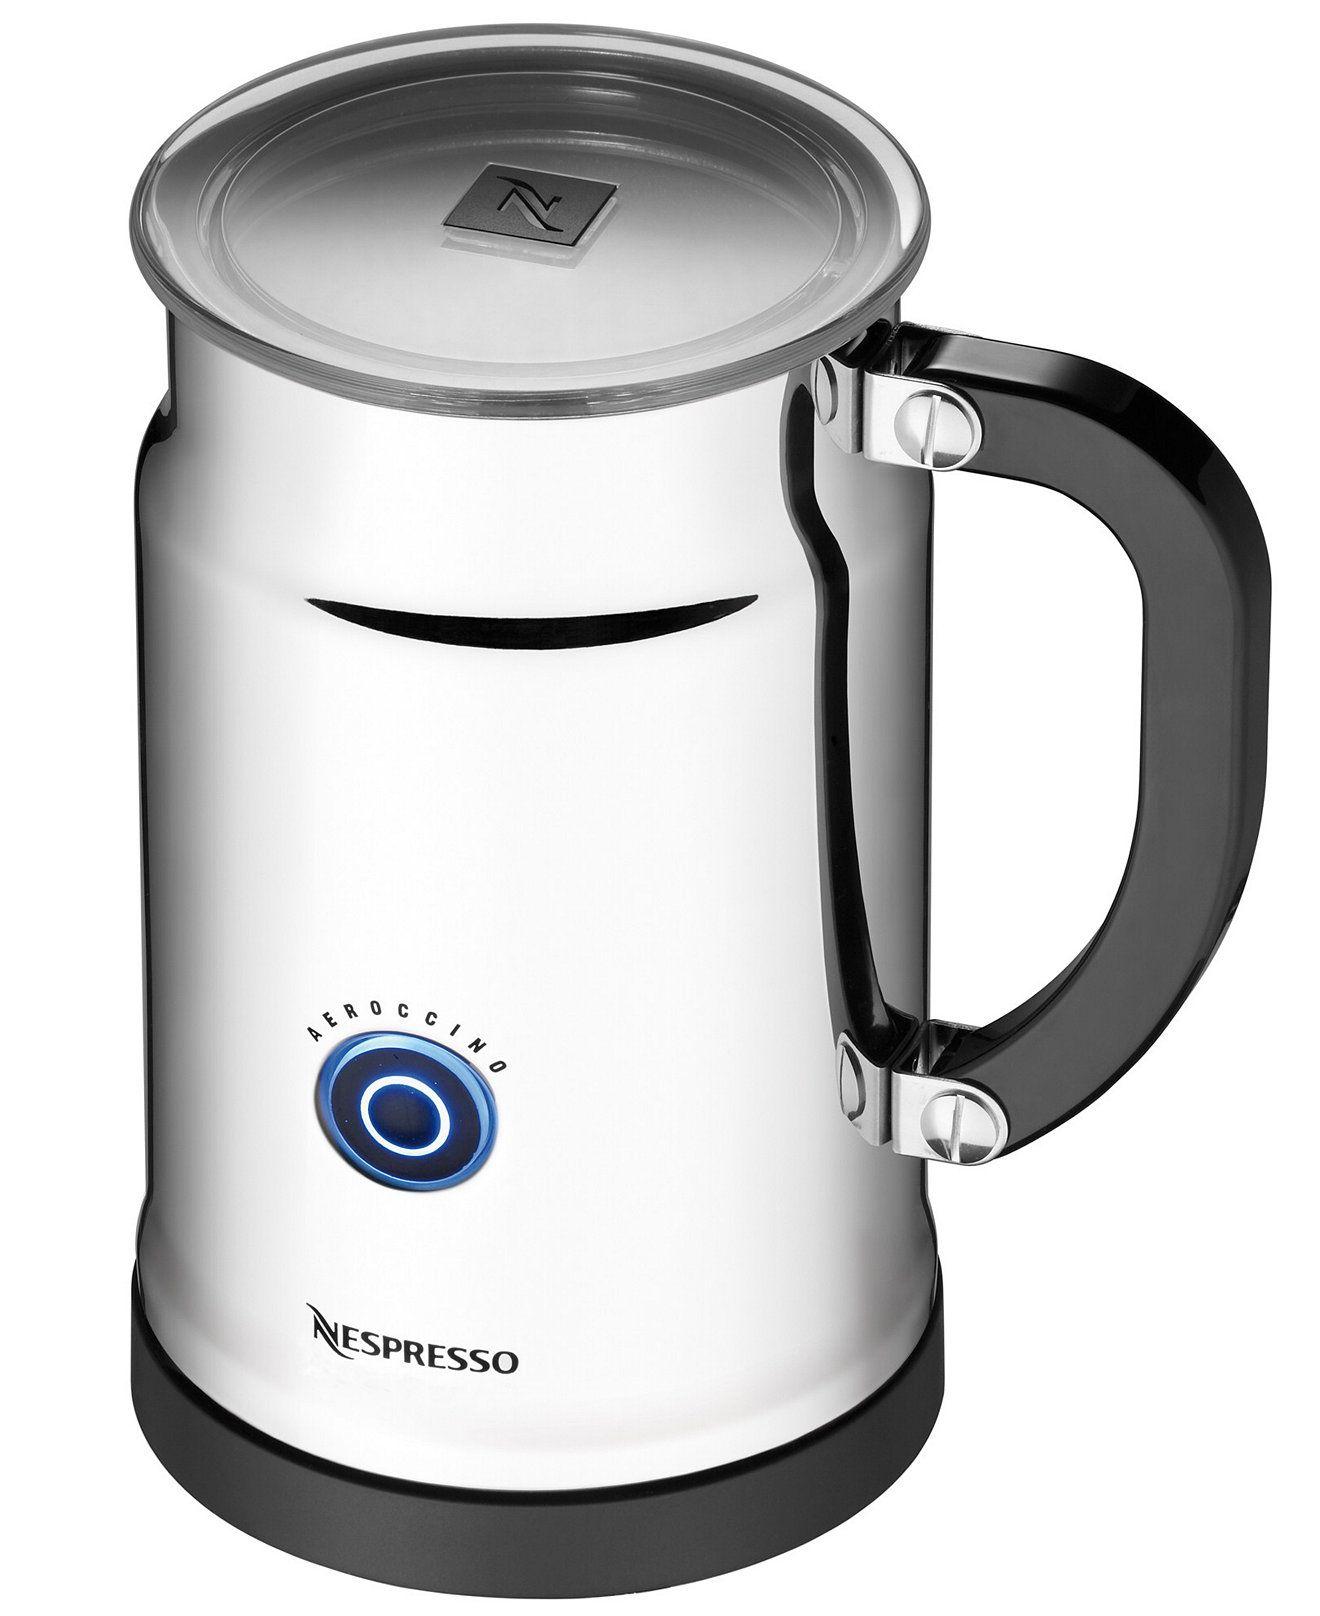 Nespresso 3192US Milk Frother, Aeroccino Plus & Reviews